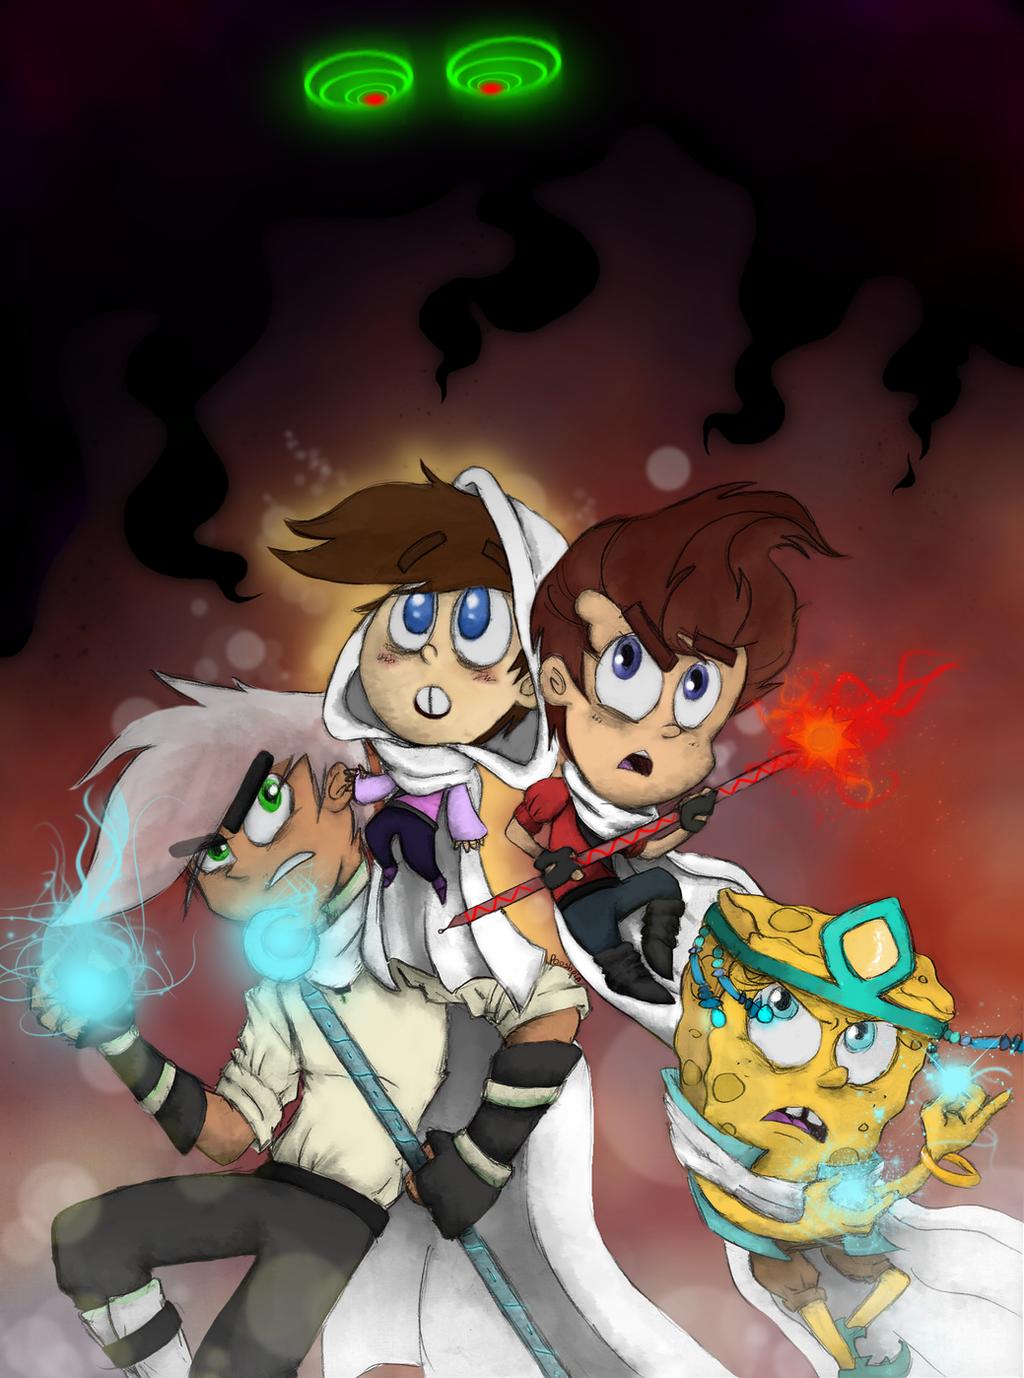 Guardians by Nicktoonacle